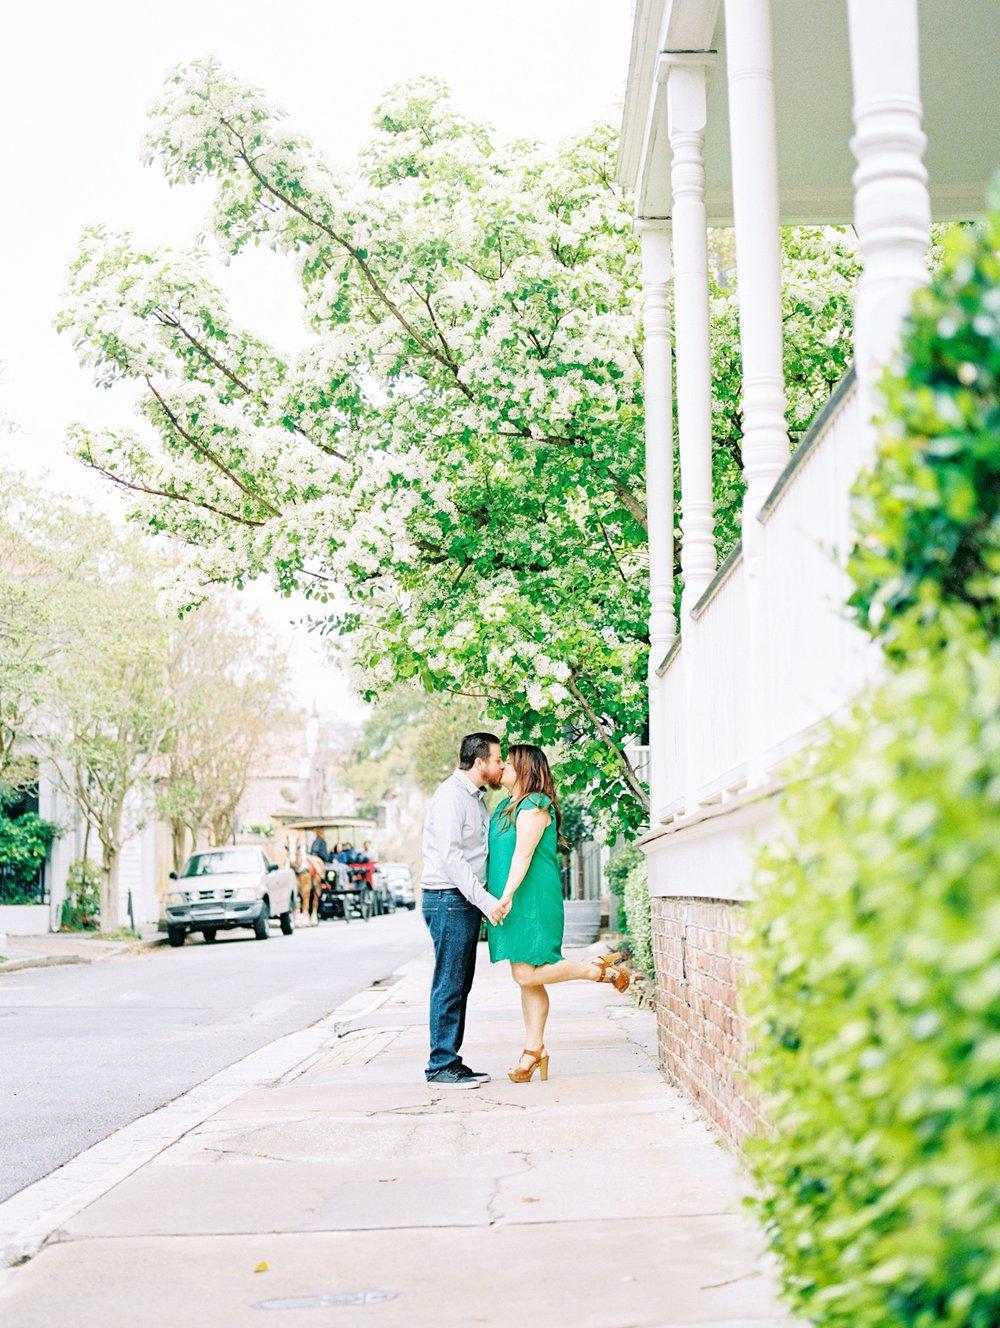 Lisa Silva Photography- Ponte Vedra Beach and Jacksonville, Florida Fine Art Film Wedding Photography- Engagement Session in Historic Charleston, South Carolina_0011.jpg